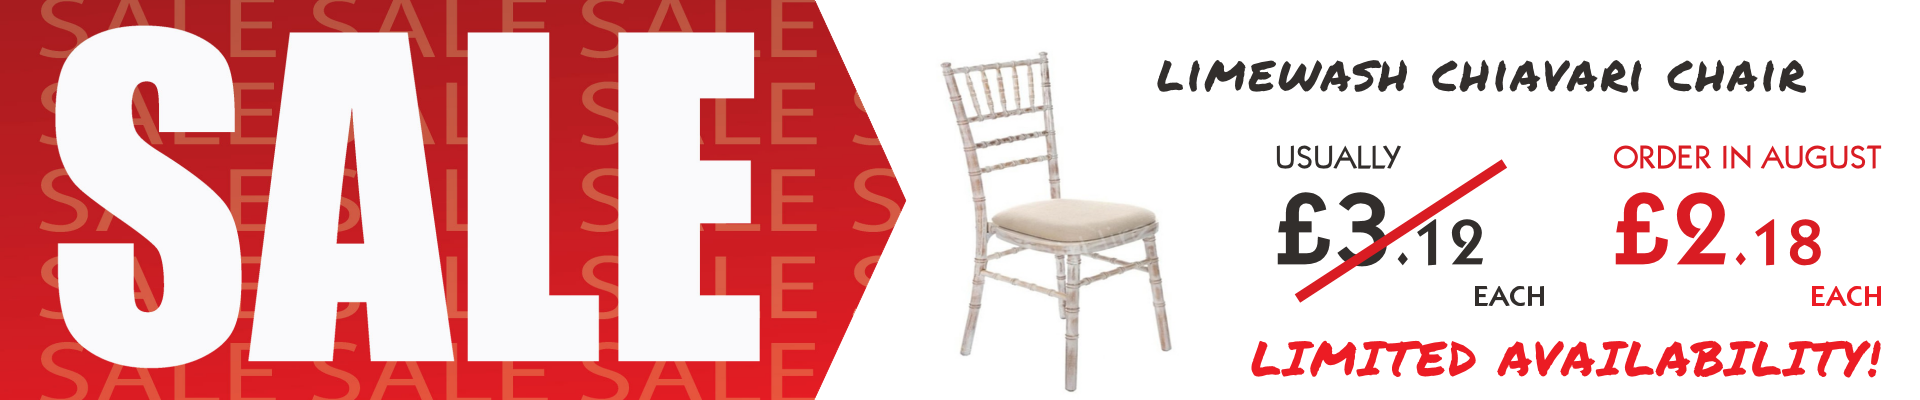 Limewash Chiavari Chair Sale